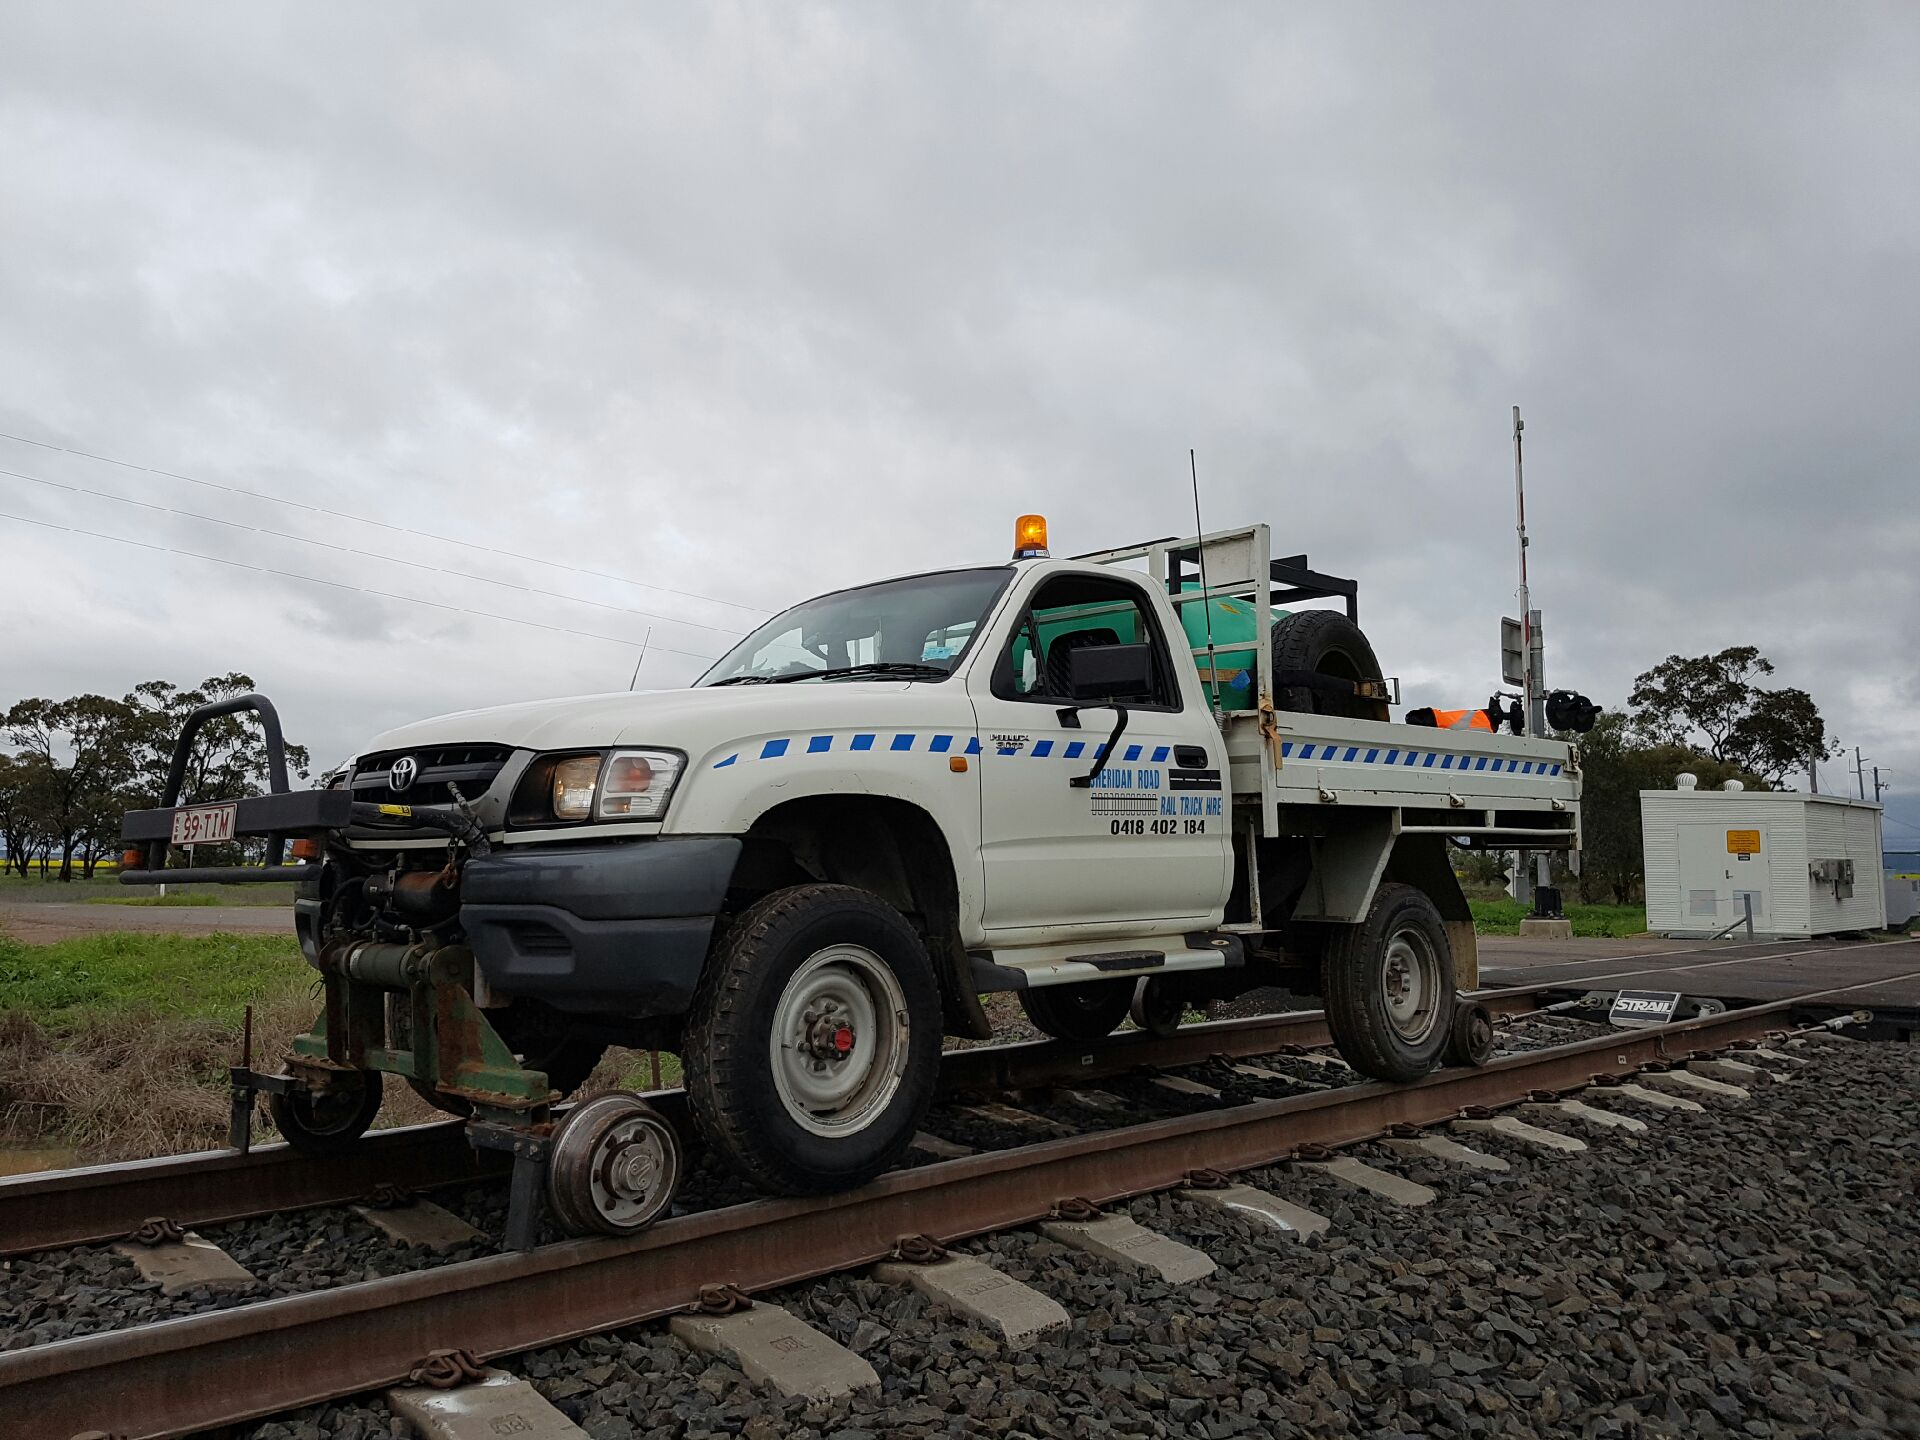 99TIM-Hirail-Toyota-Hilux-Refuelling-Vehicle-Tray-5.jpg